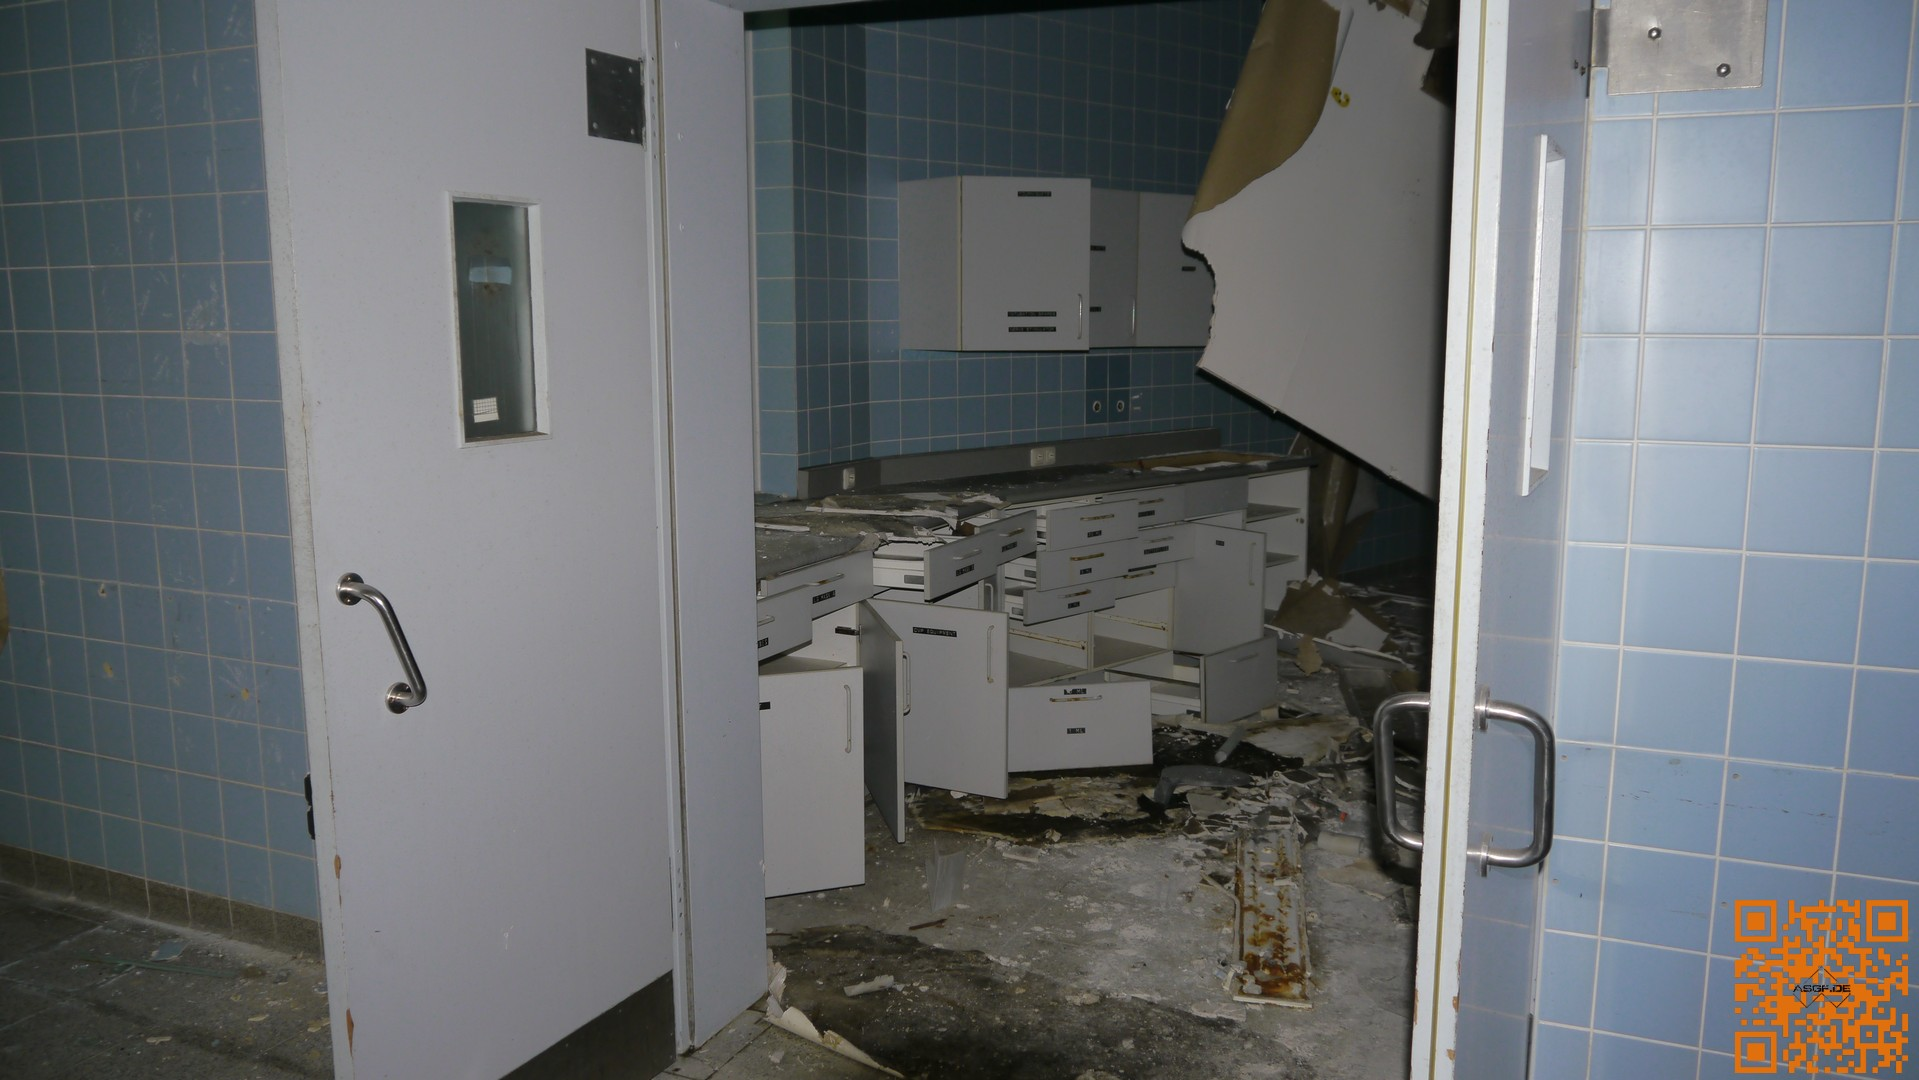 hospital2-17-09-16-15